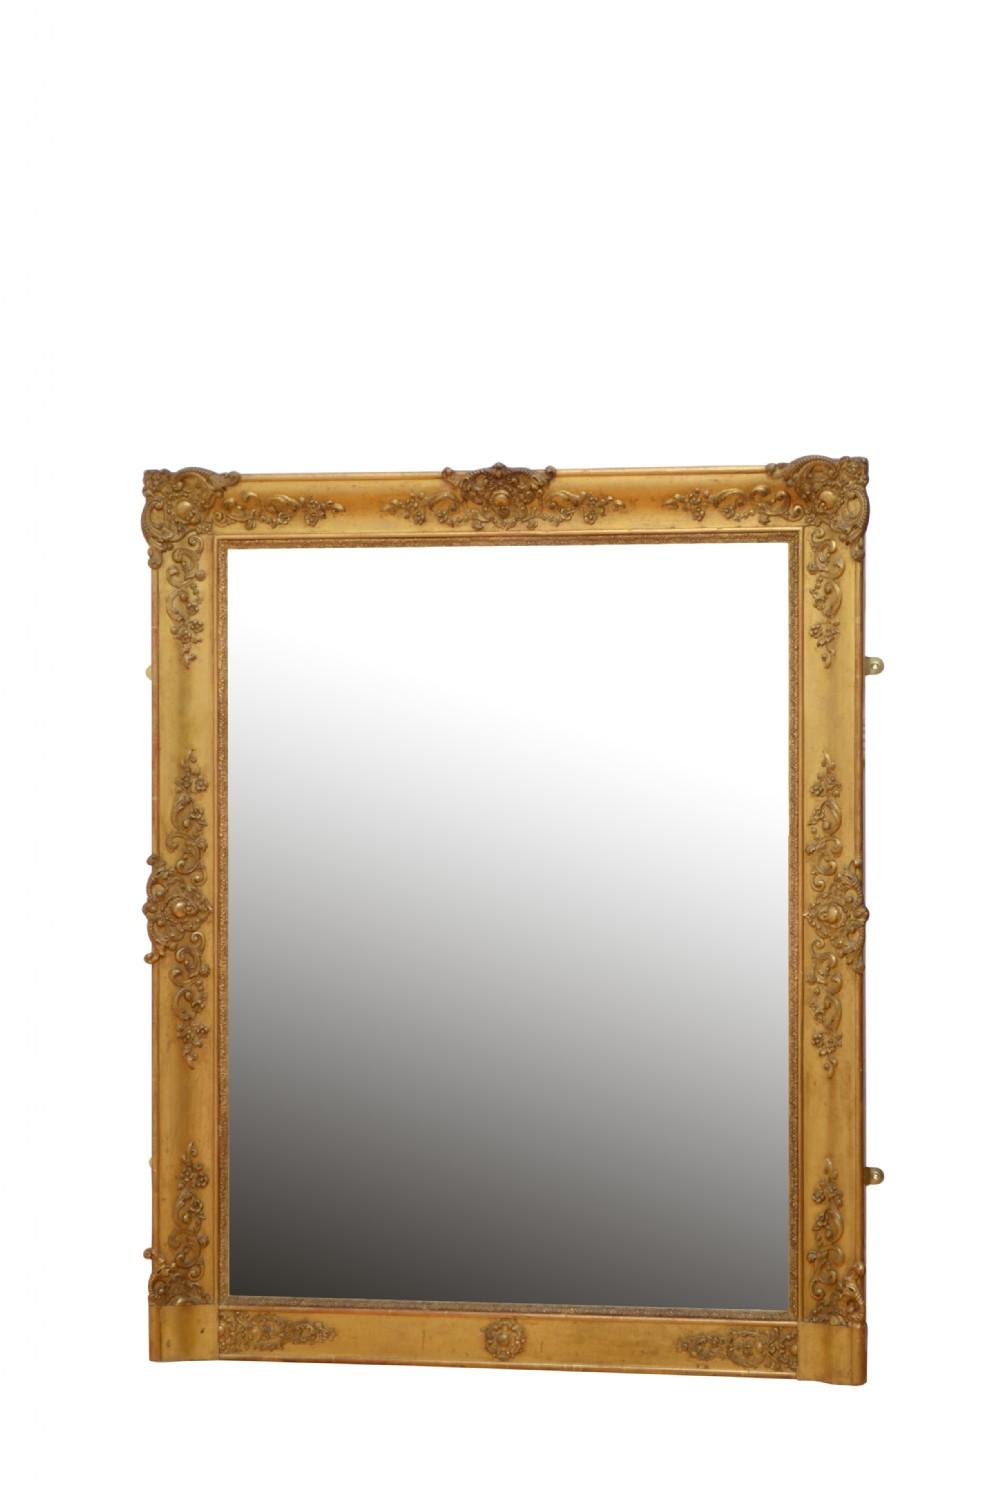 antique french xixth century mirror